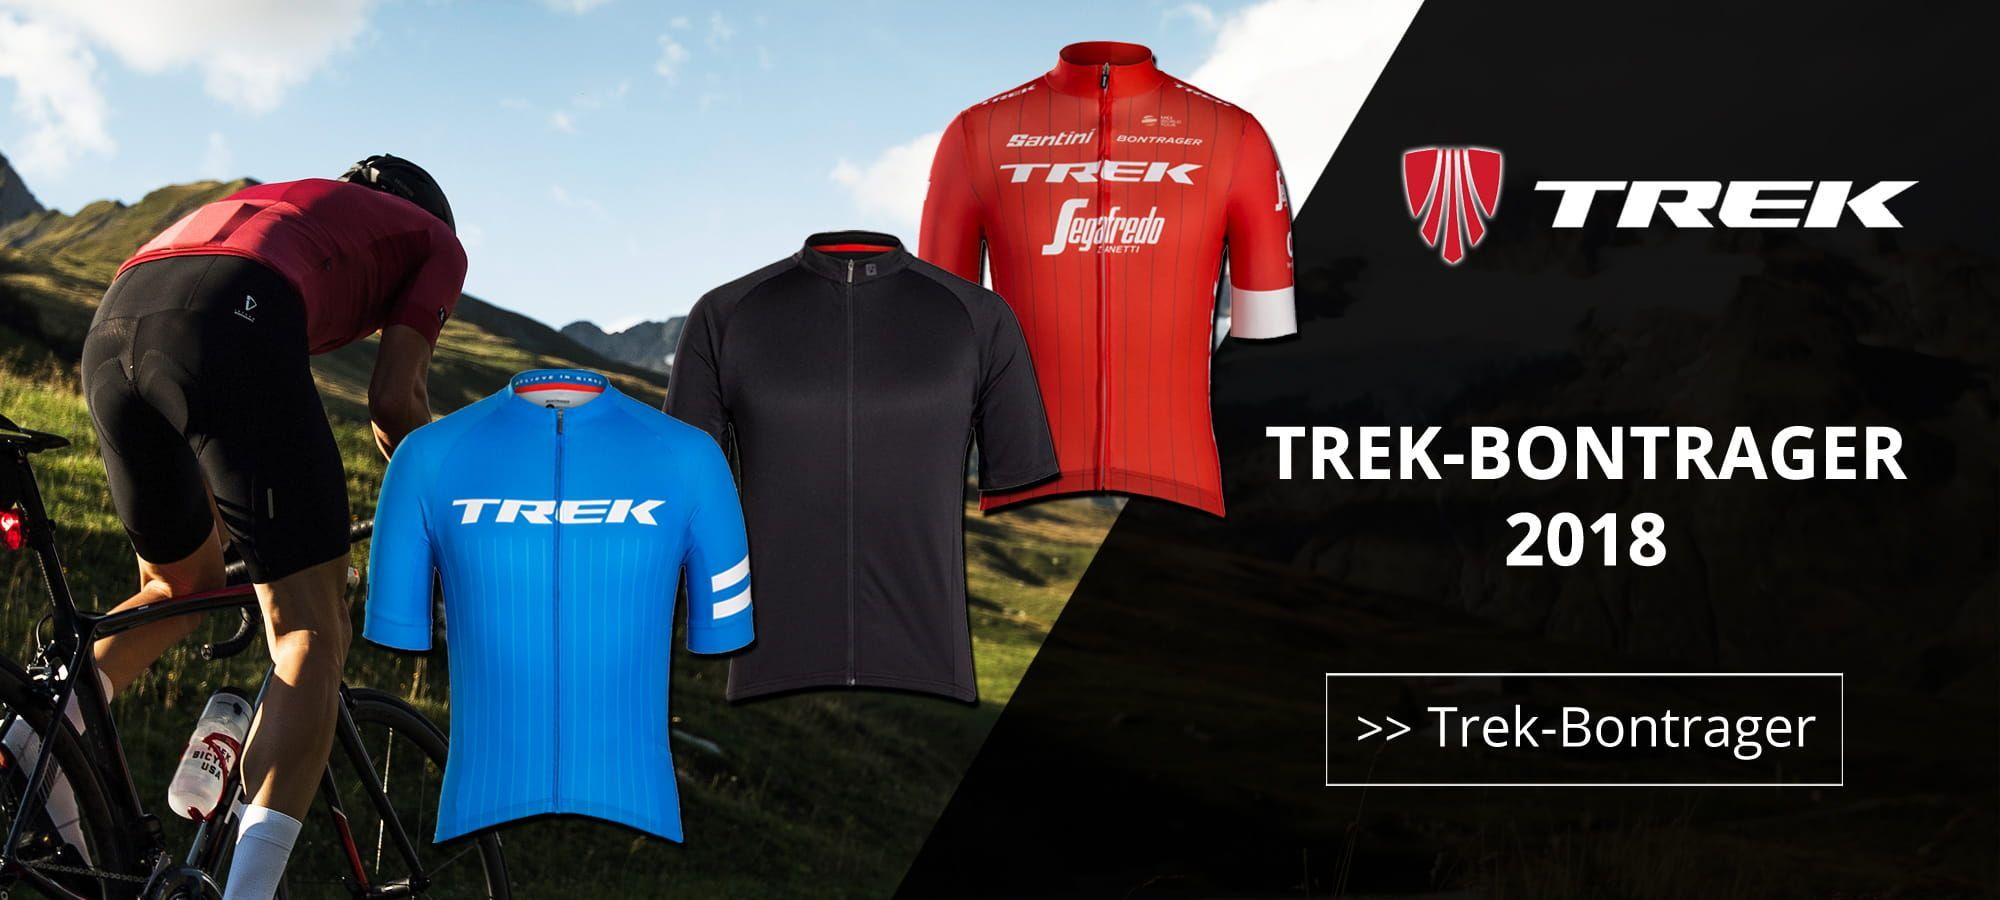 Trek-Bontrager Verano 2018